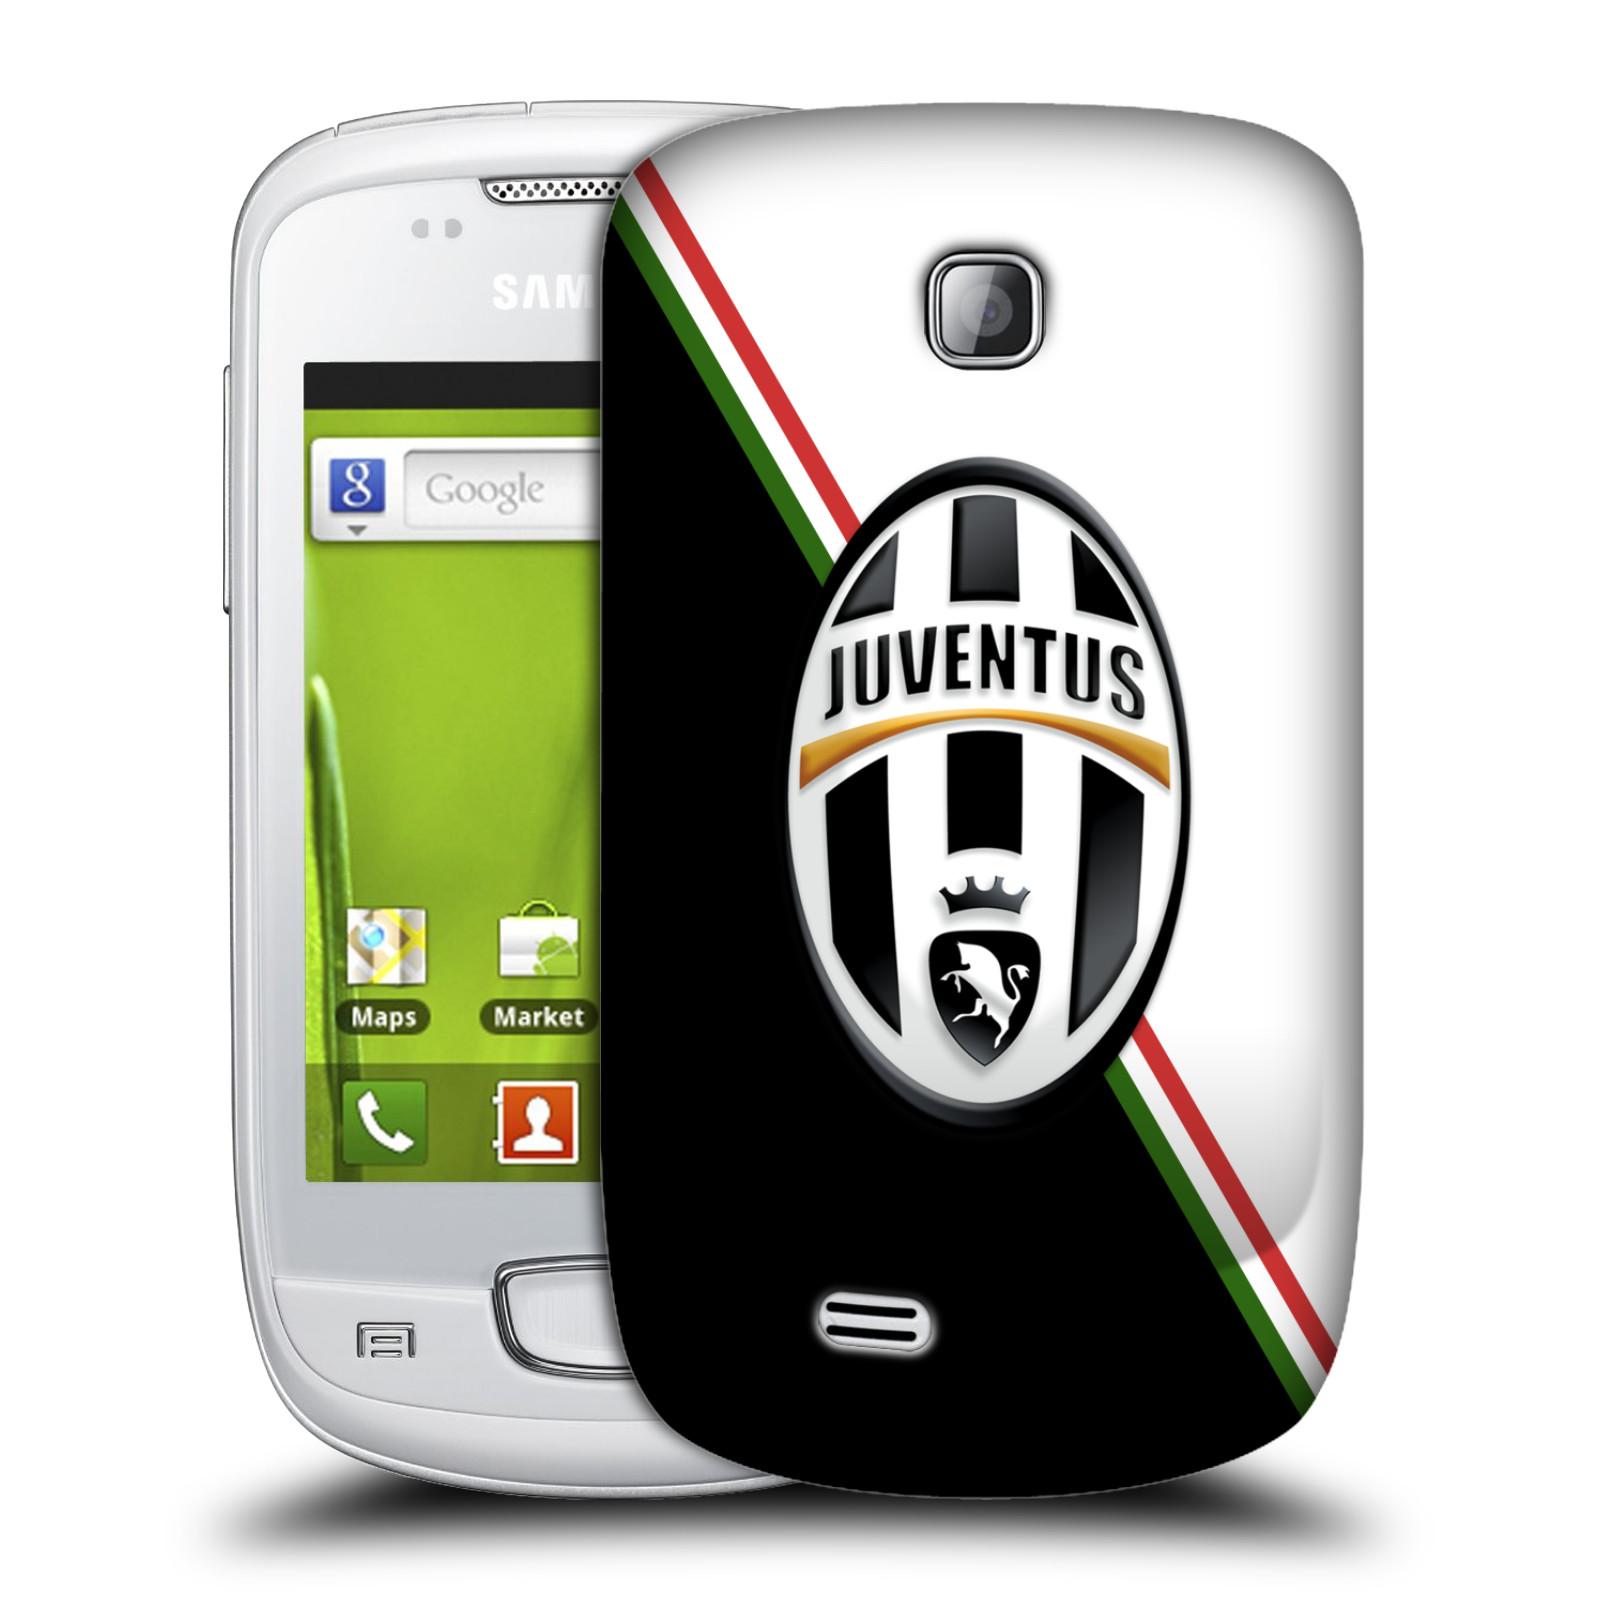 Plastové pouzdro na mobil Samsung Galaxy Mini HEAD CASE Juventus FC - Black and White (Plastový kryt či obal na mobilní telefon Juventus FC Official pro Samsung Galaxy Mini GT-S5570 / GT-S5570i)